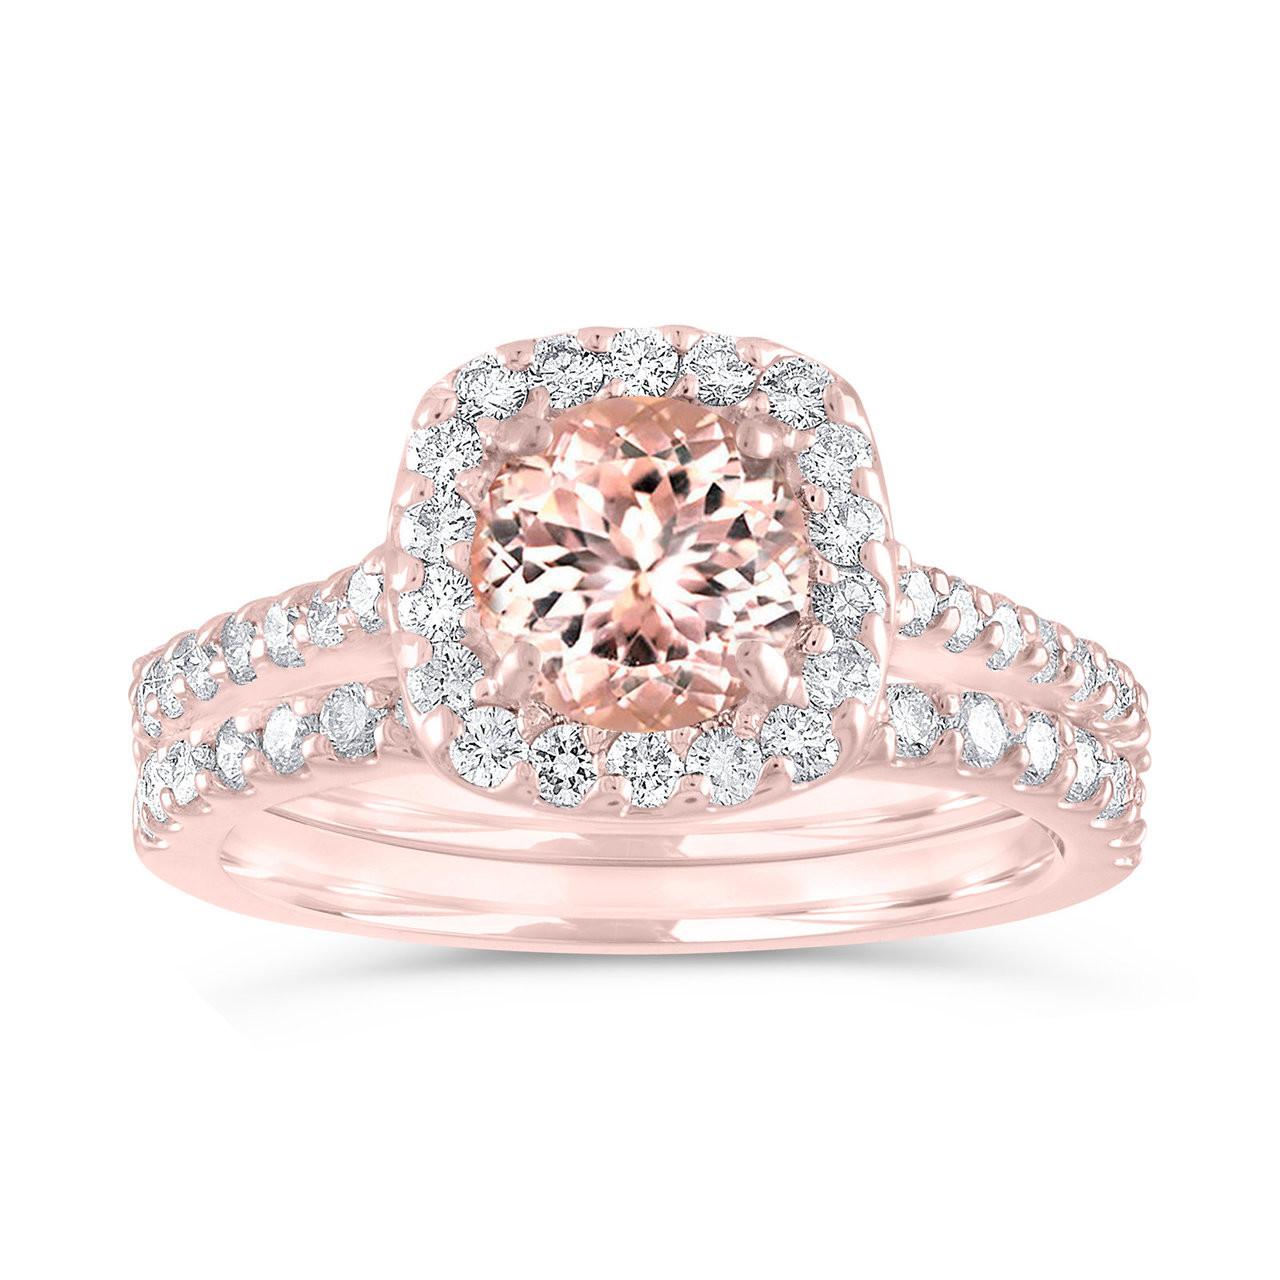 43fafb916 Morganite Engagement Ring Set Rose Gold, Pink Morganite and ...